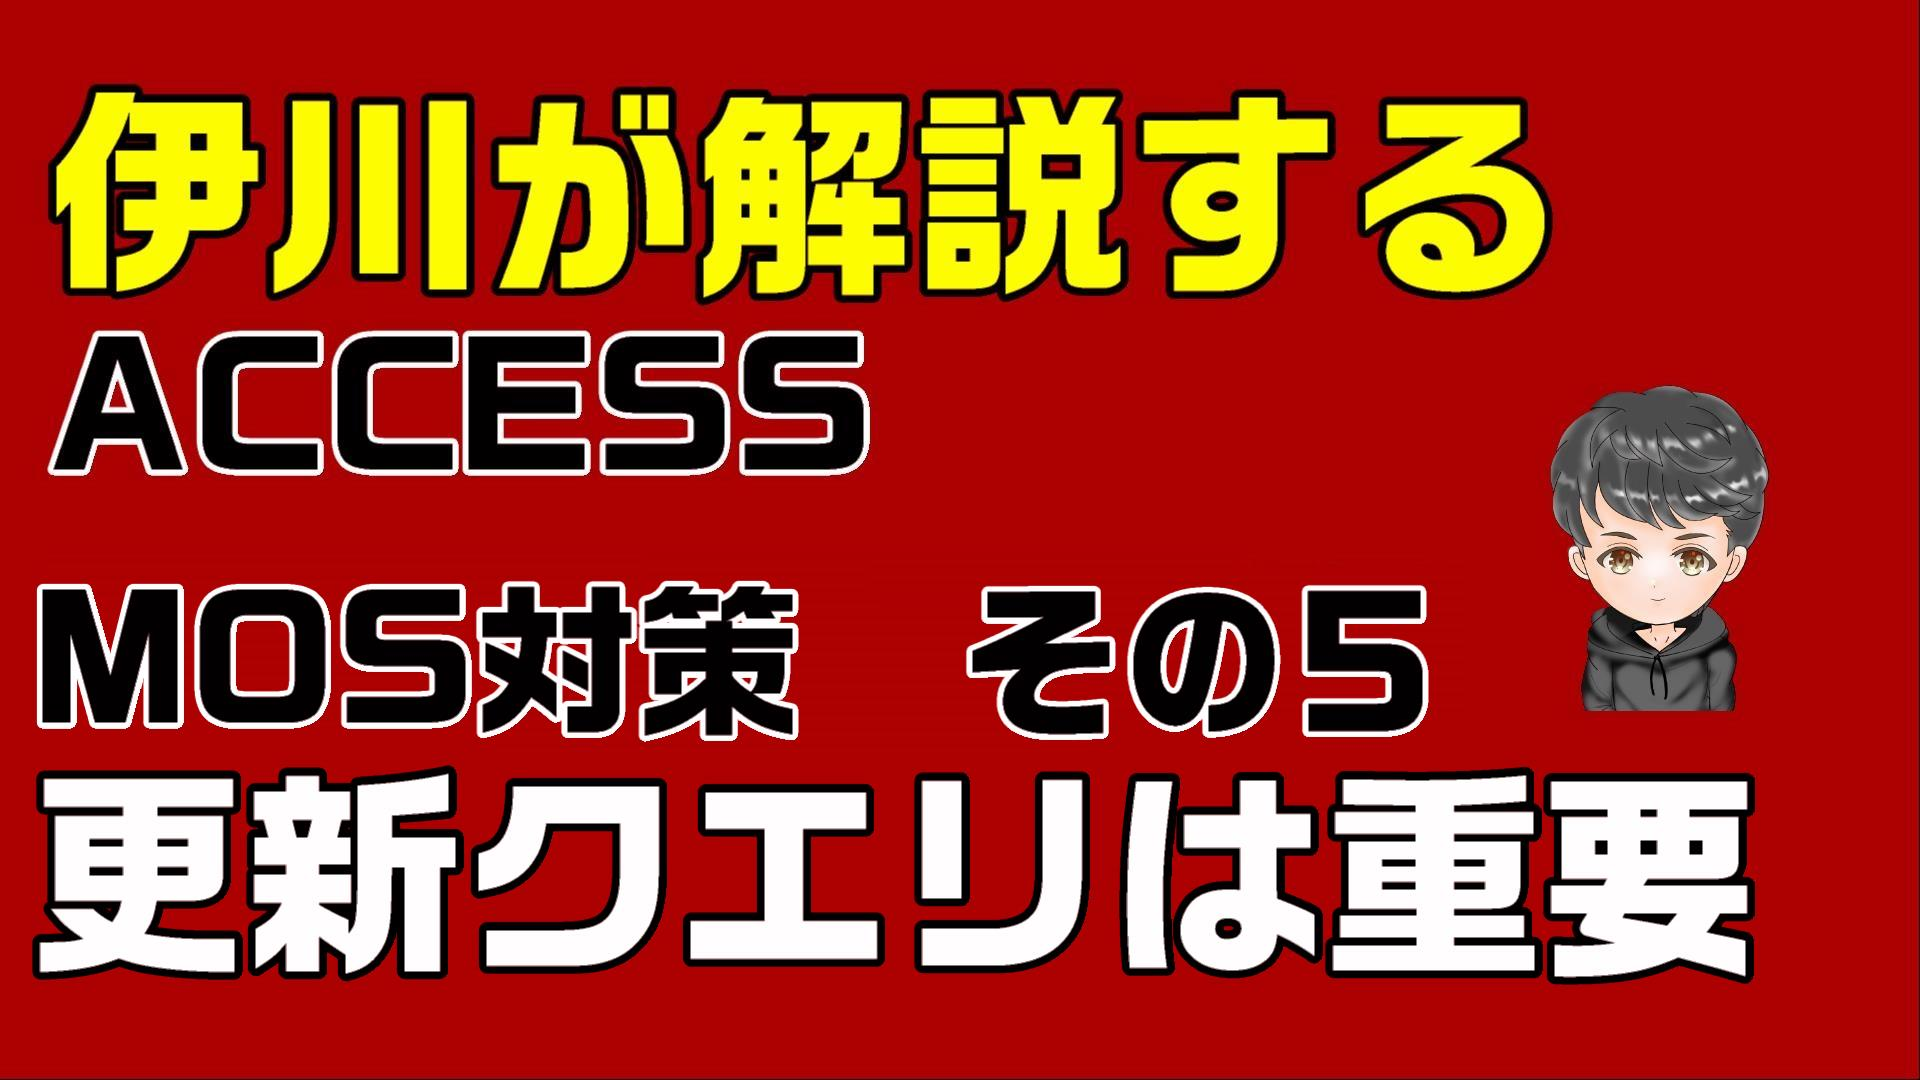 【ACCESS】ACCESSのMOS試験対策 その5